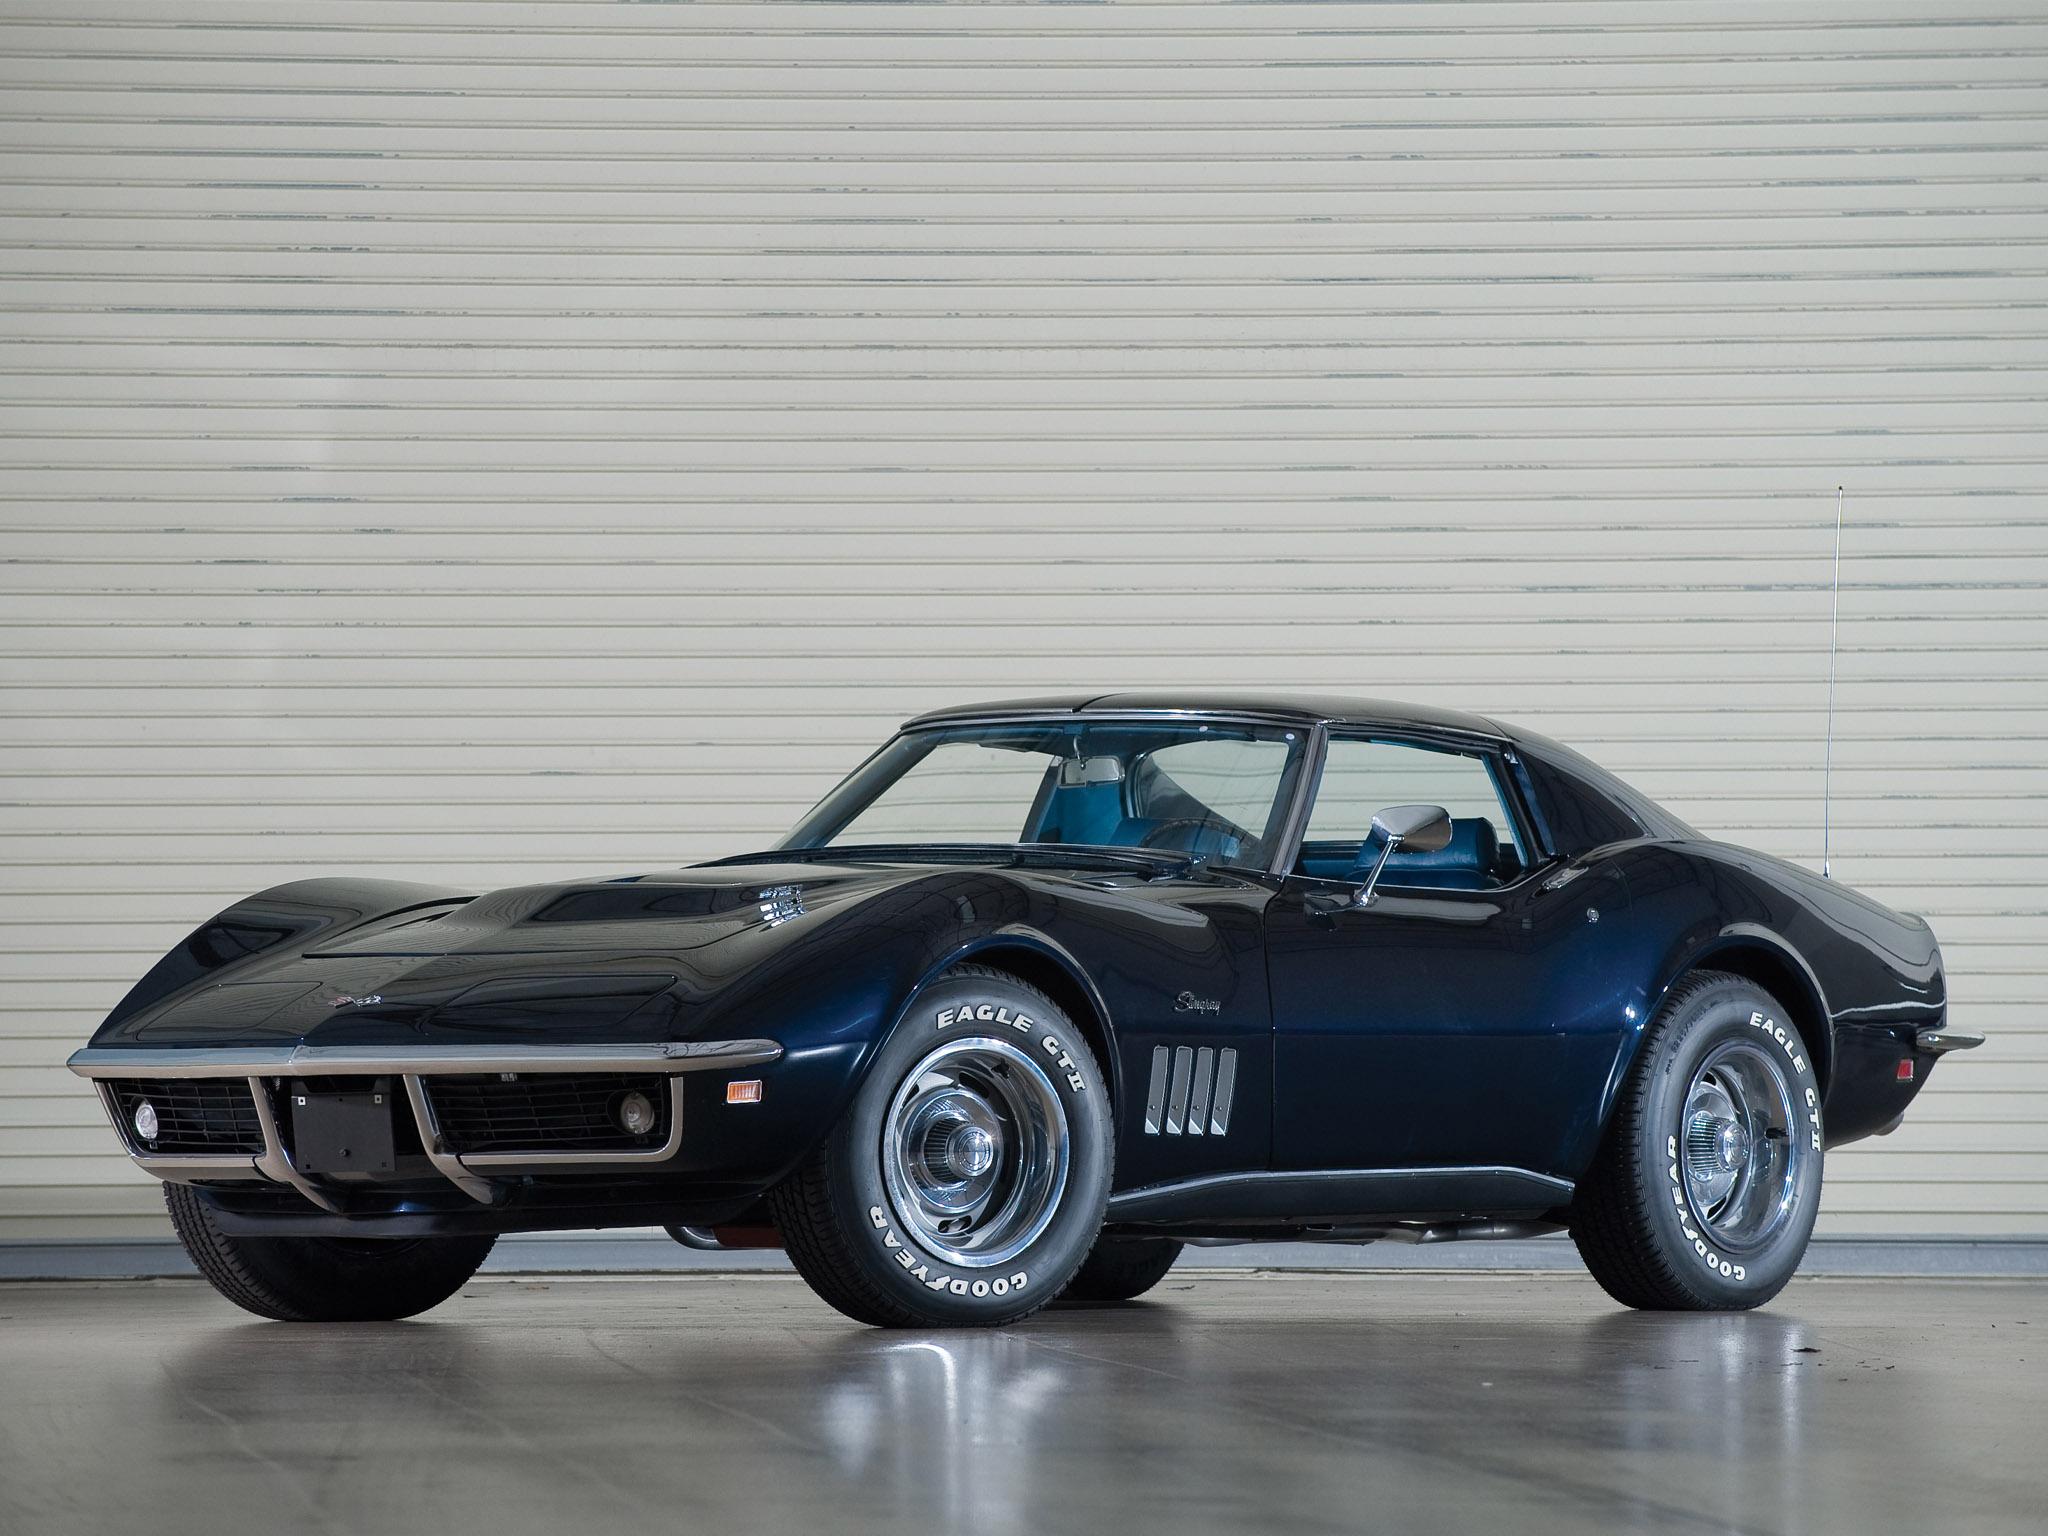 1969 chevrolet corvette c3 stingray l36 427 coupe classic muscle supercar supercars wallpaper. Black Bedroom Furniture Sets. Home Design Ideas